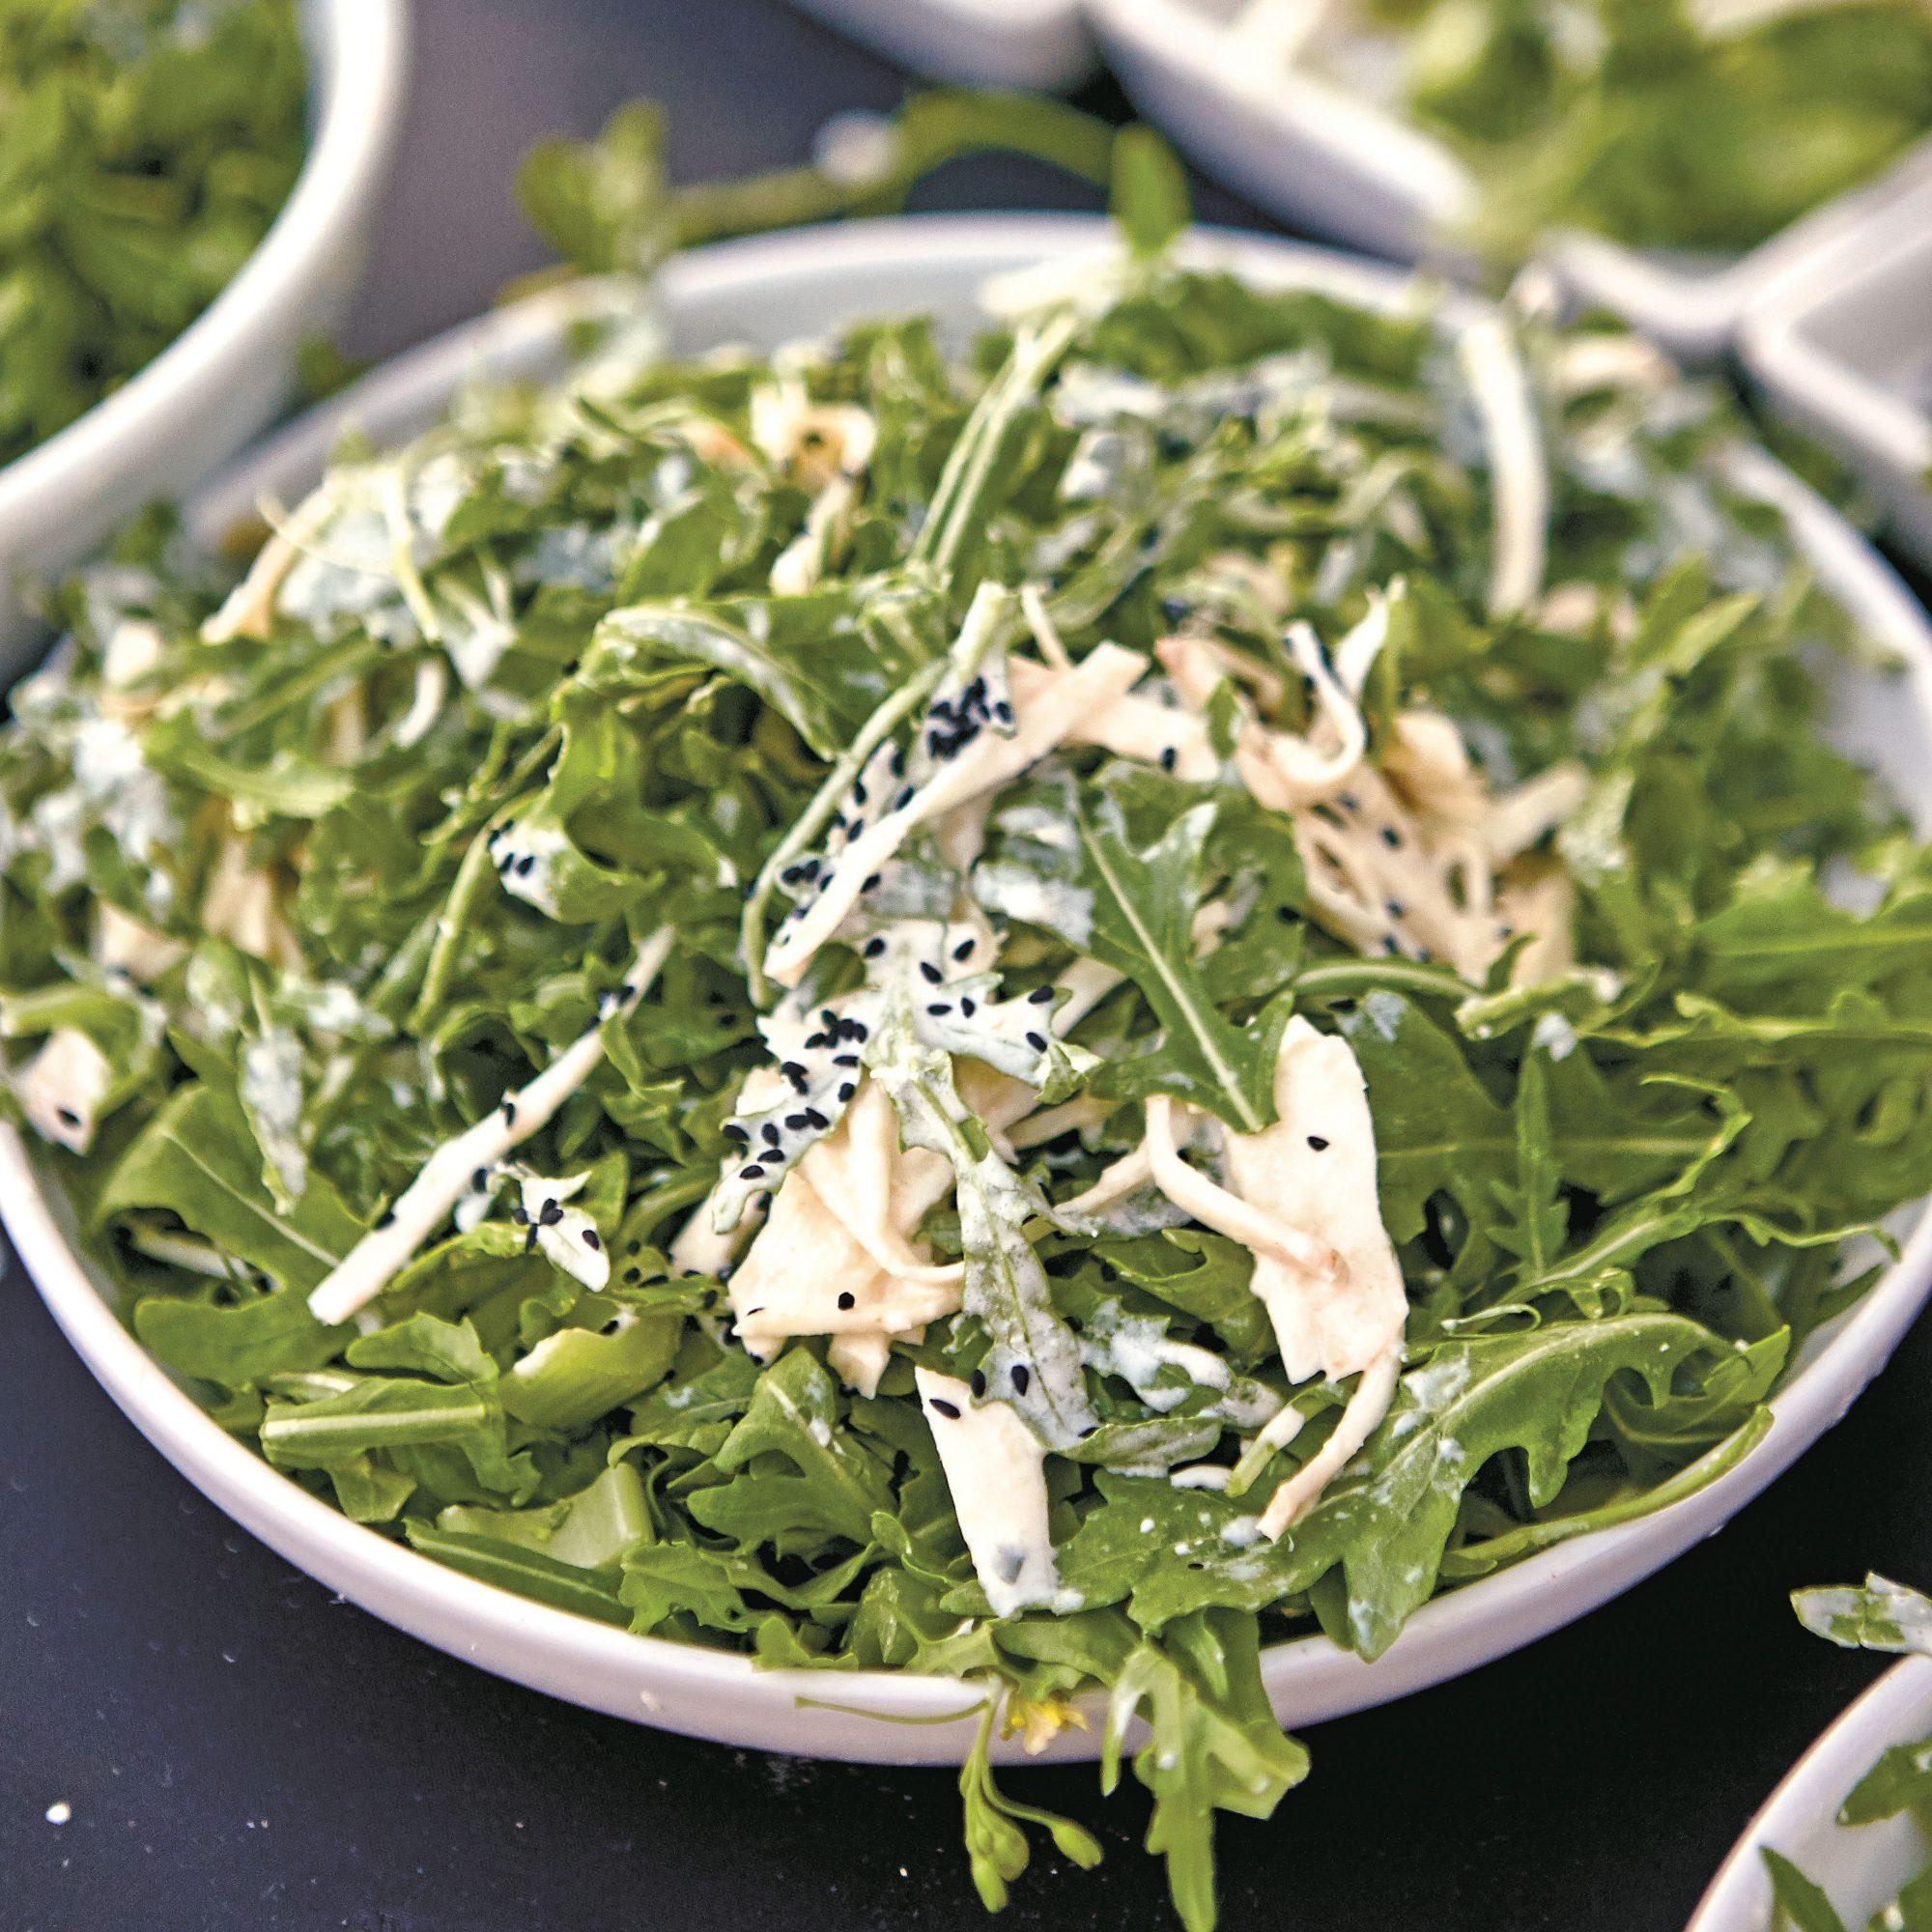 Celery Root Arugula Salad with Horseradish Dressing